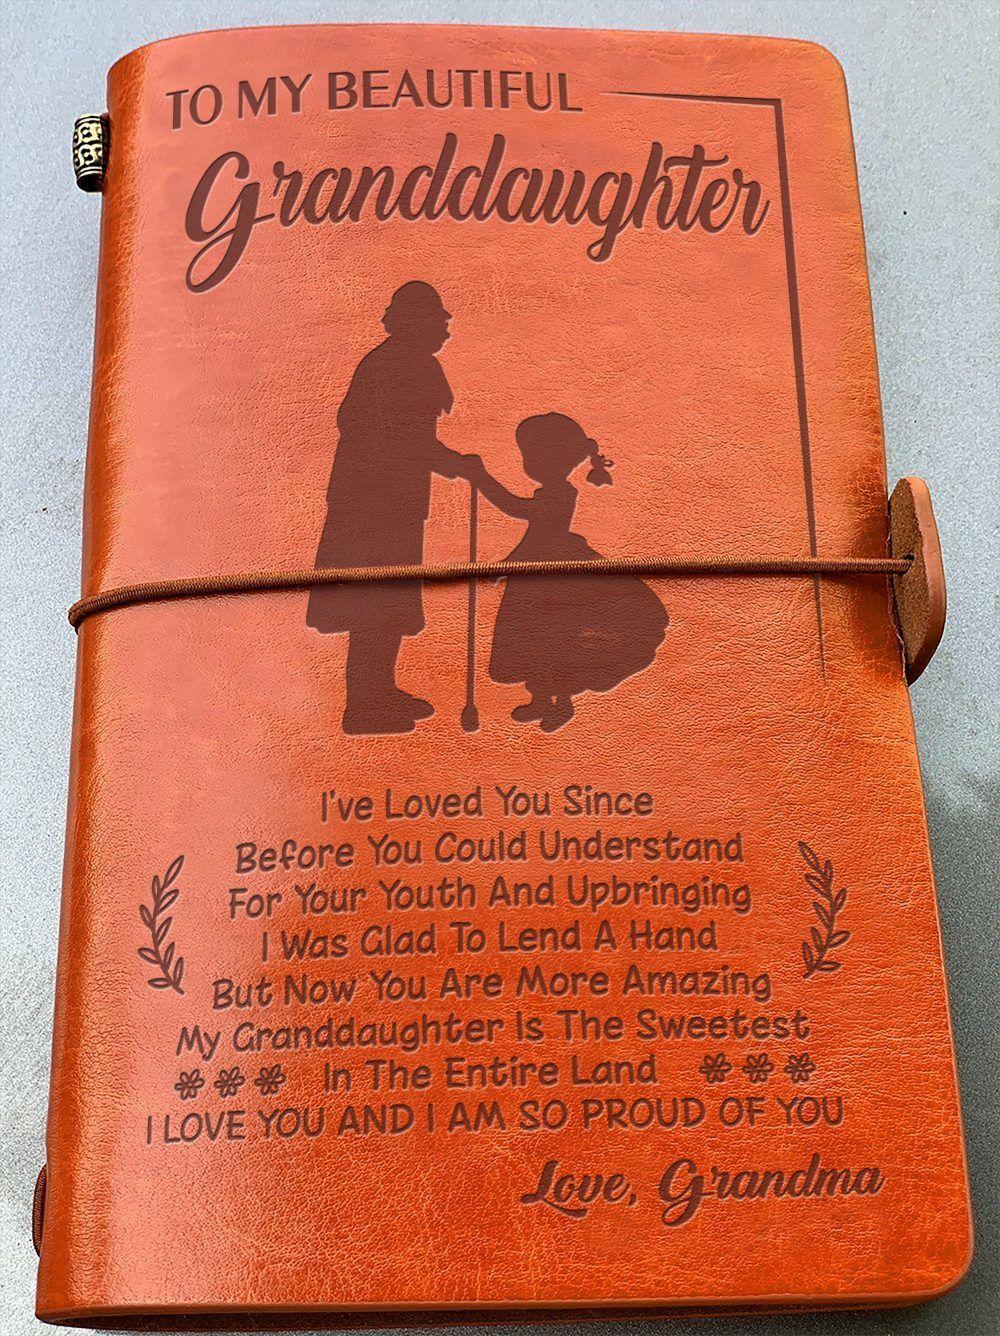 To My Beautiful Granddaughter Vintage Journal Granddaughter S Gift 4330 Forever Love Gifts In 2020 Granddaughter Gift Love Gifts Vintage Journal